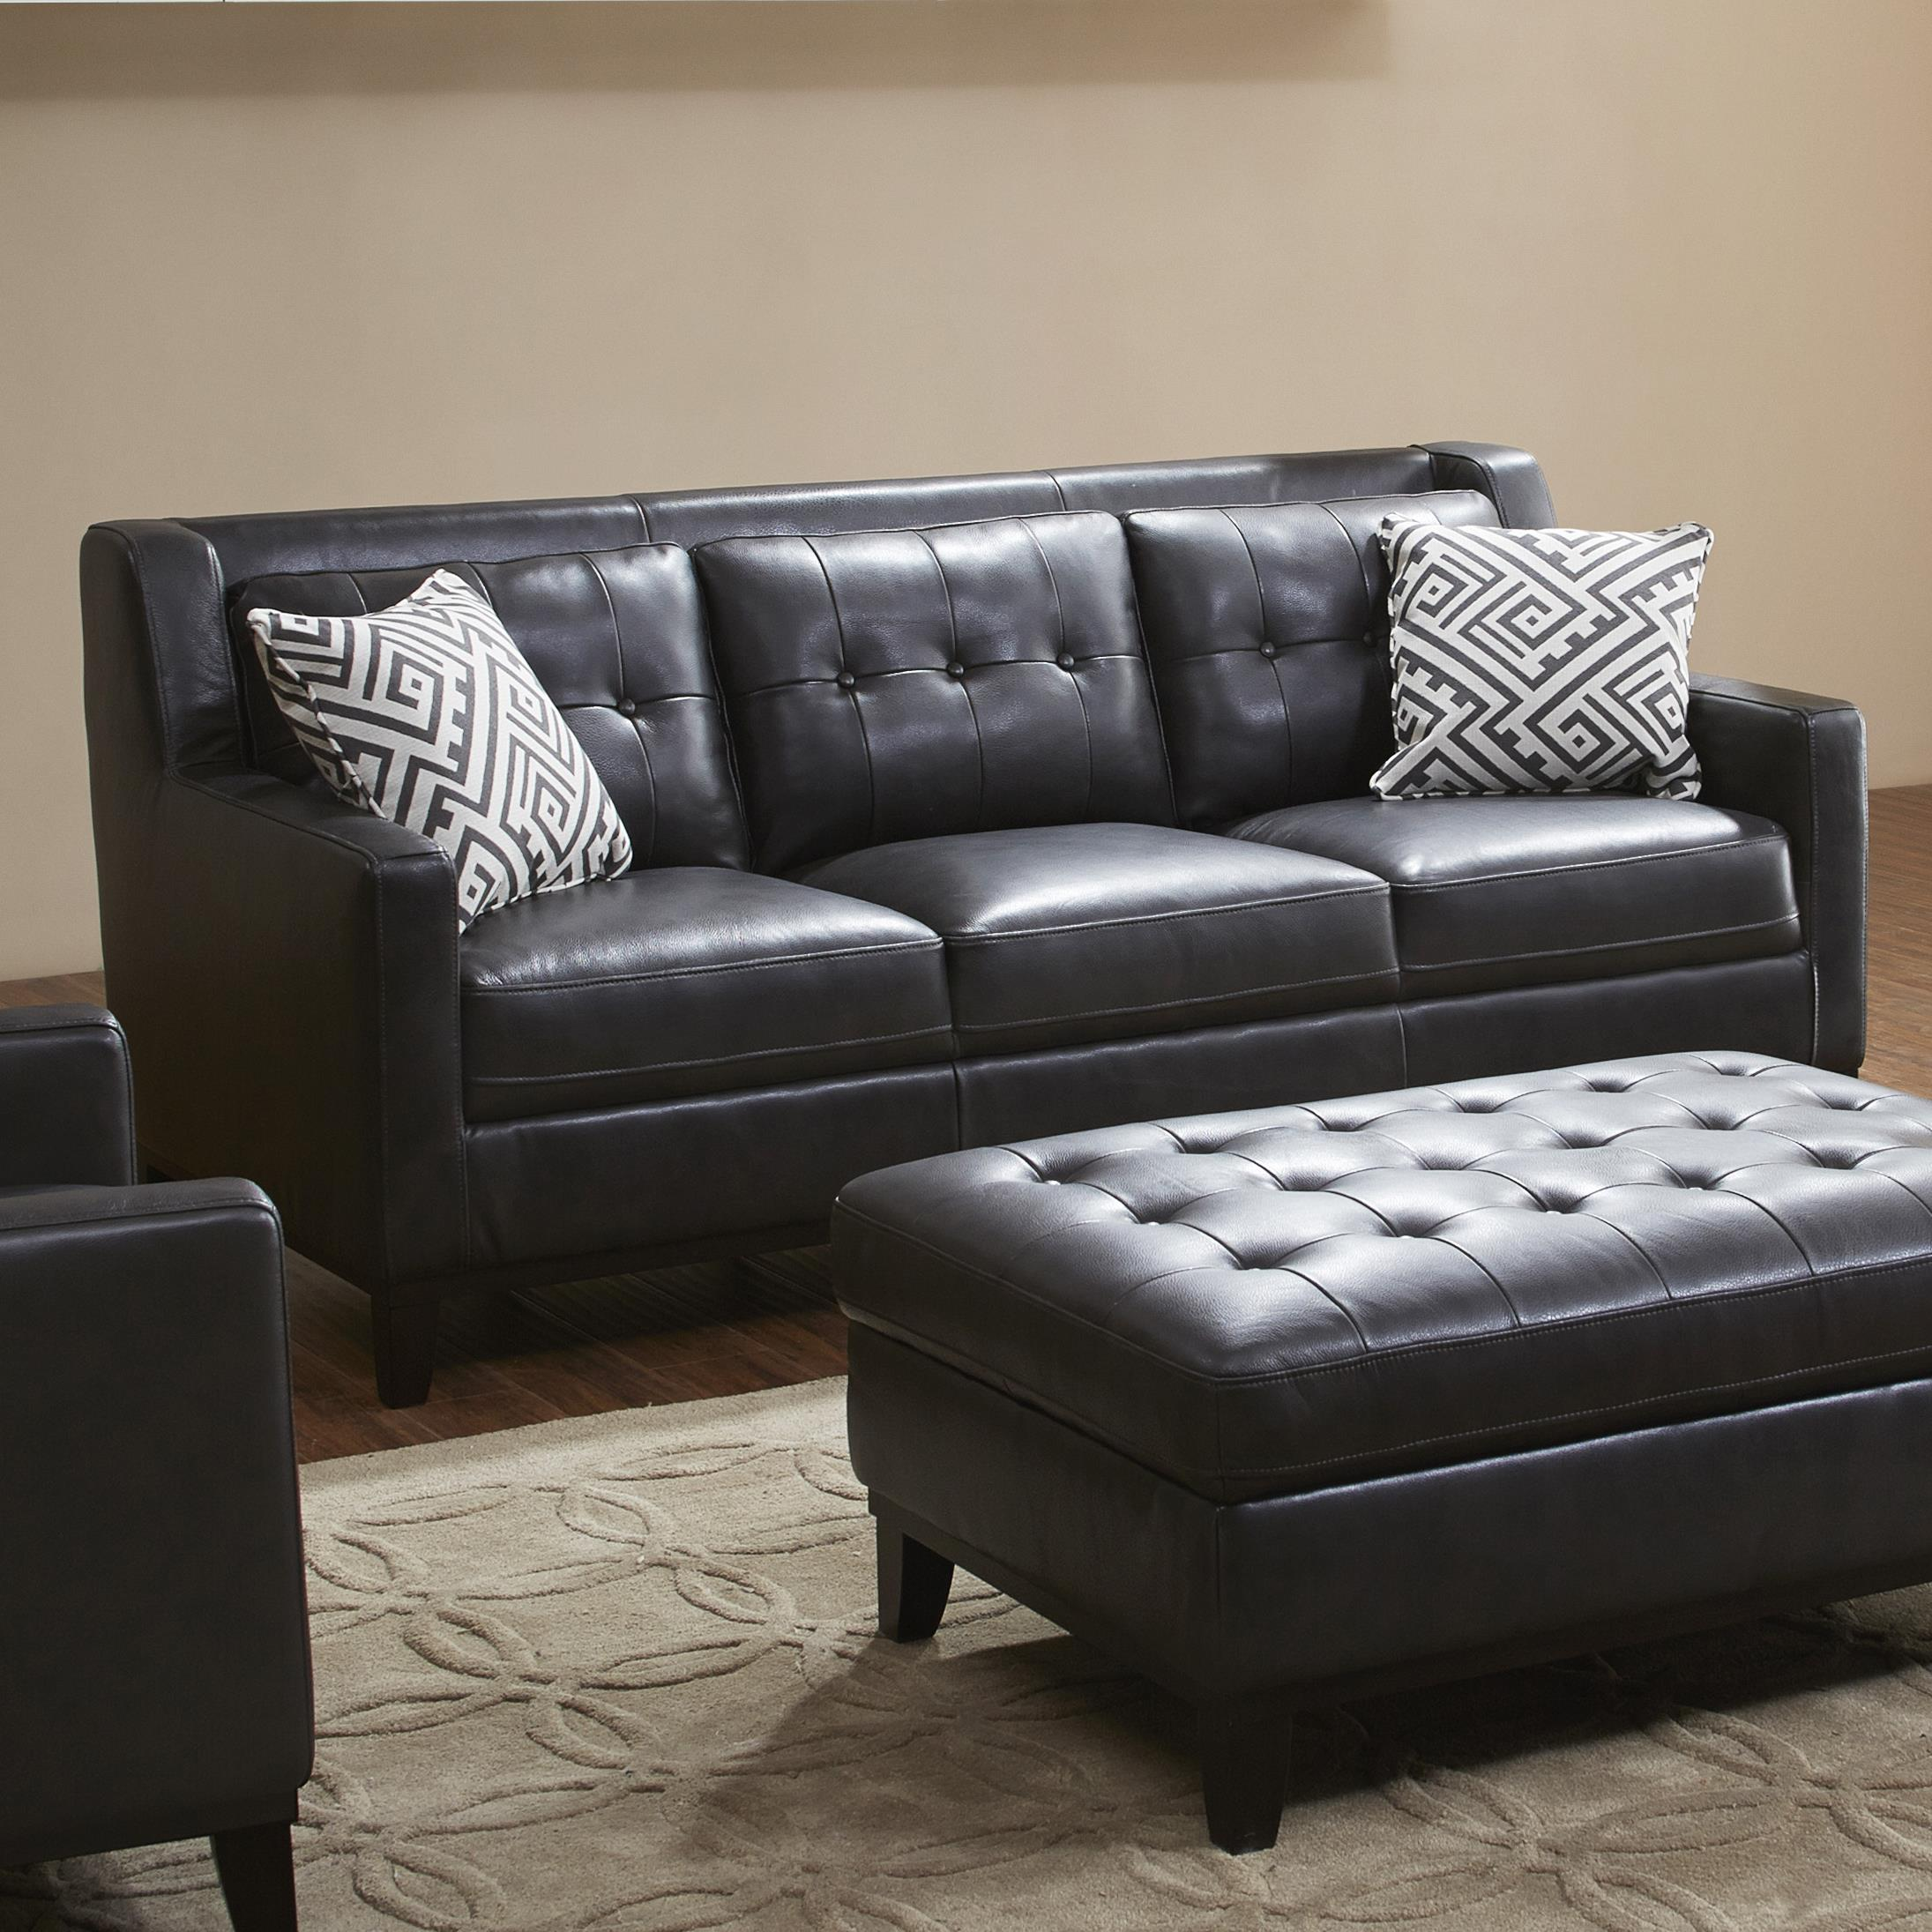 Urban Evolution Devon Leather Sofa - Item Number: 1838BS-M1215-L066